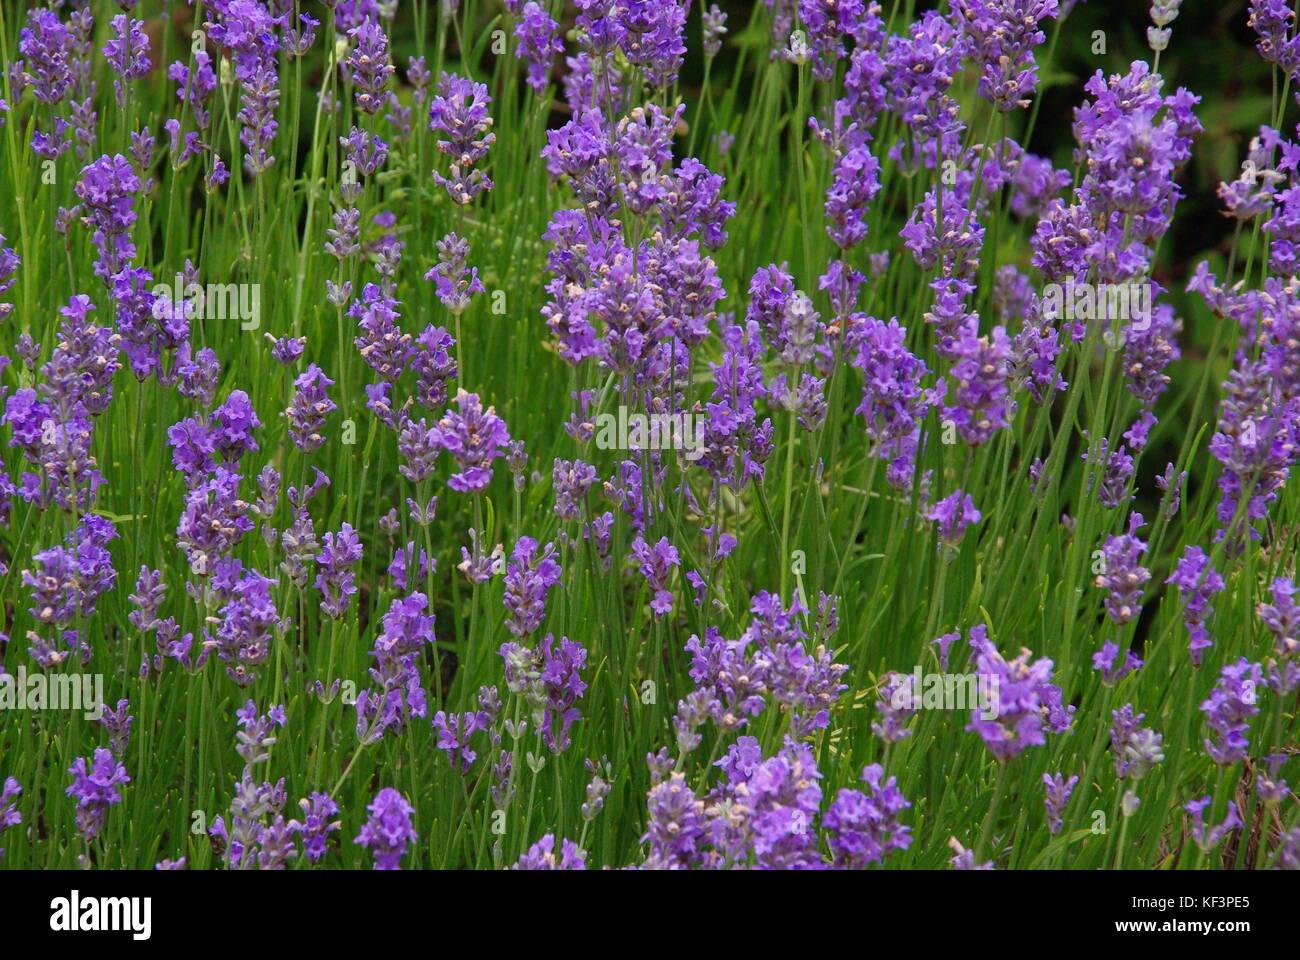 Lavender Garden - Stock Image